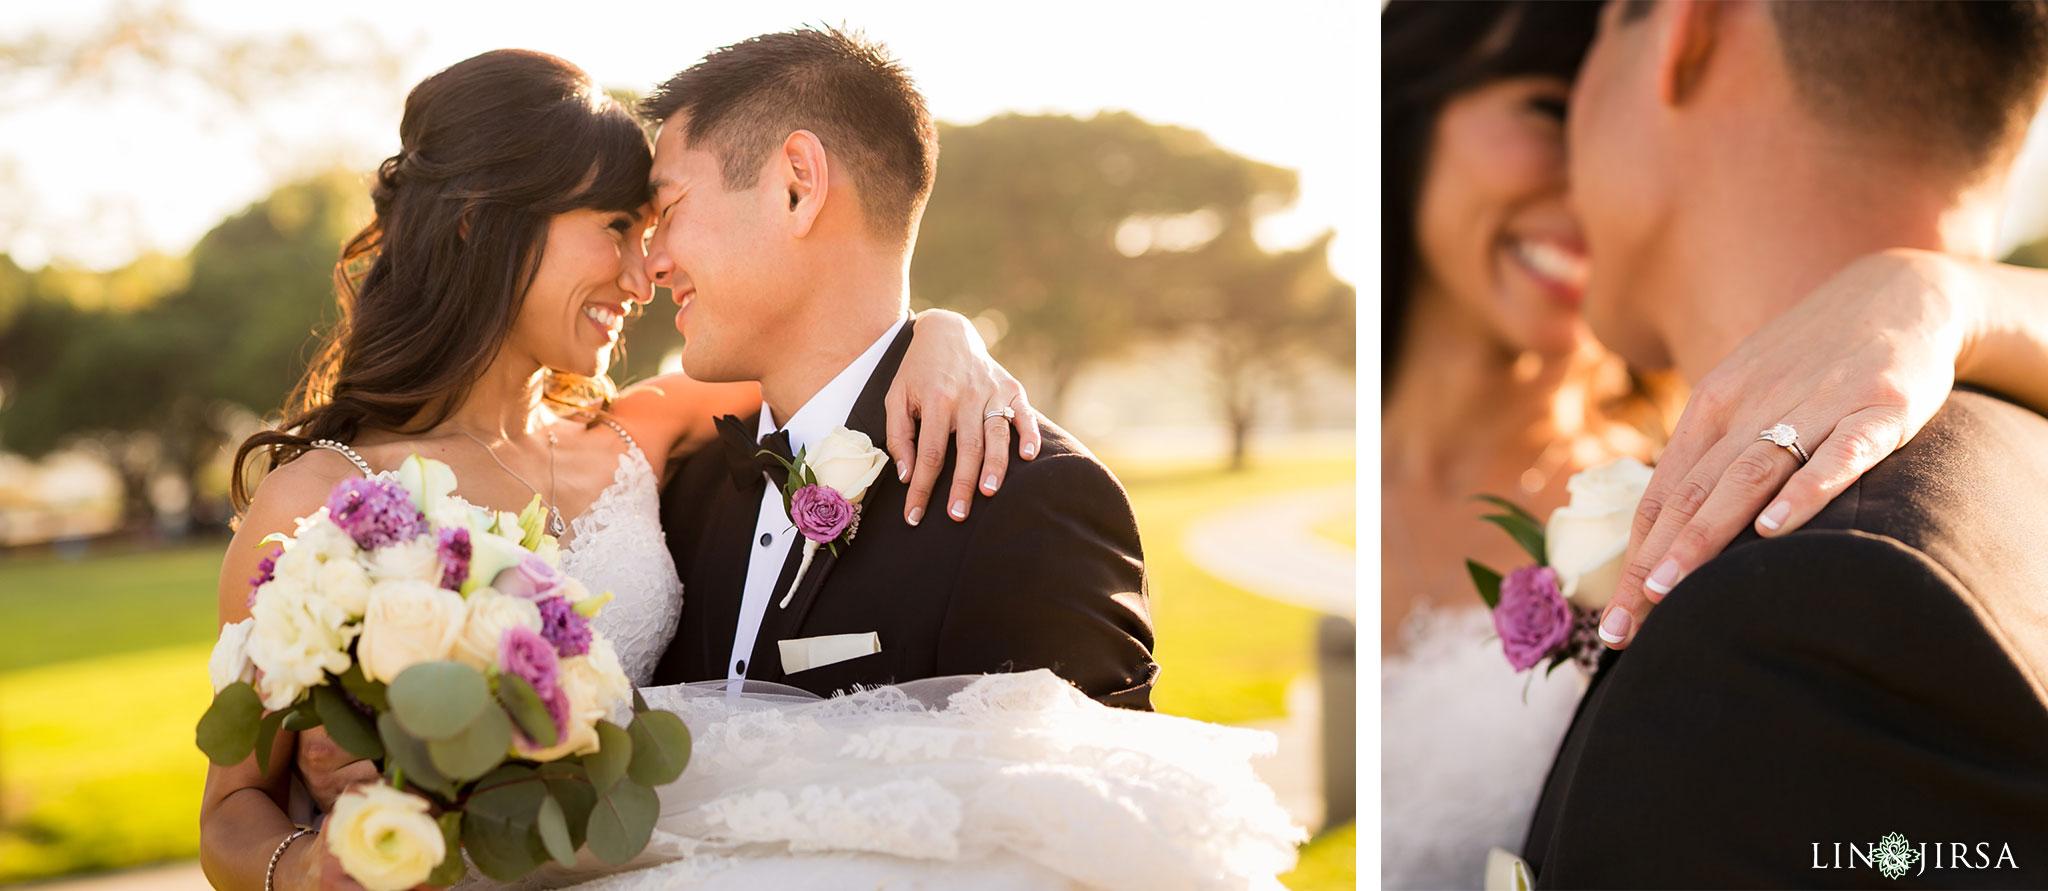 30 laguna cliffs marriott dana point wedding photography